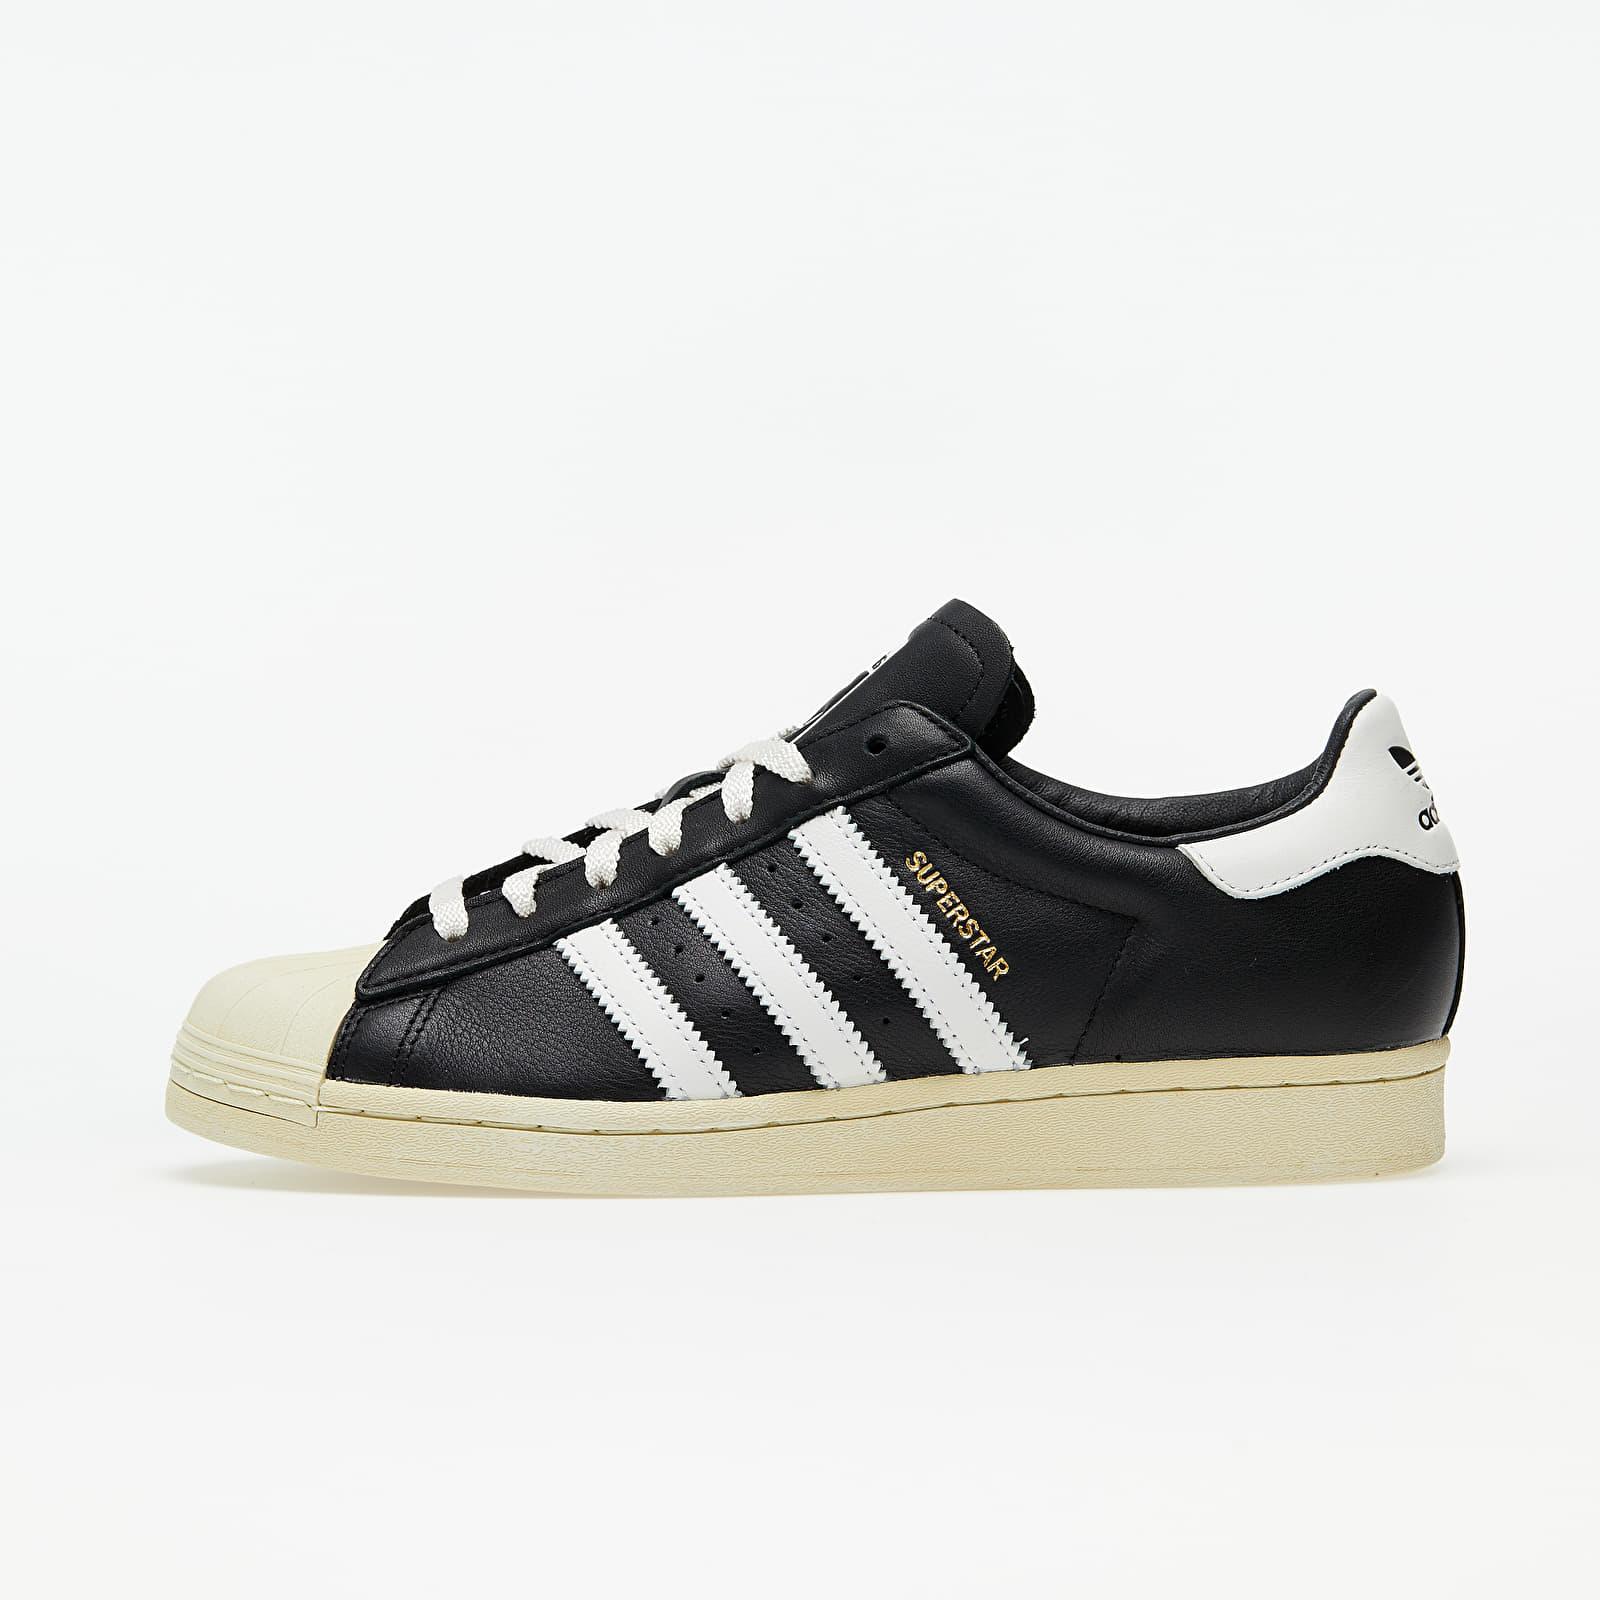 Men's shoes adidas Superstar Core Black/ Crystal White/ Blue